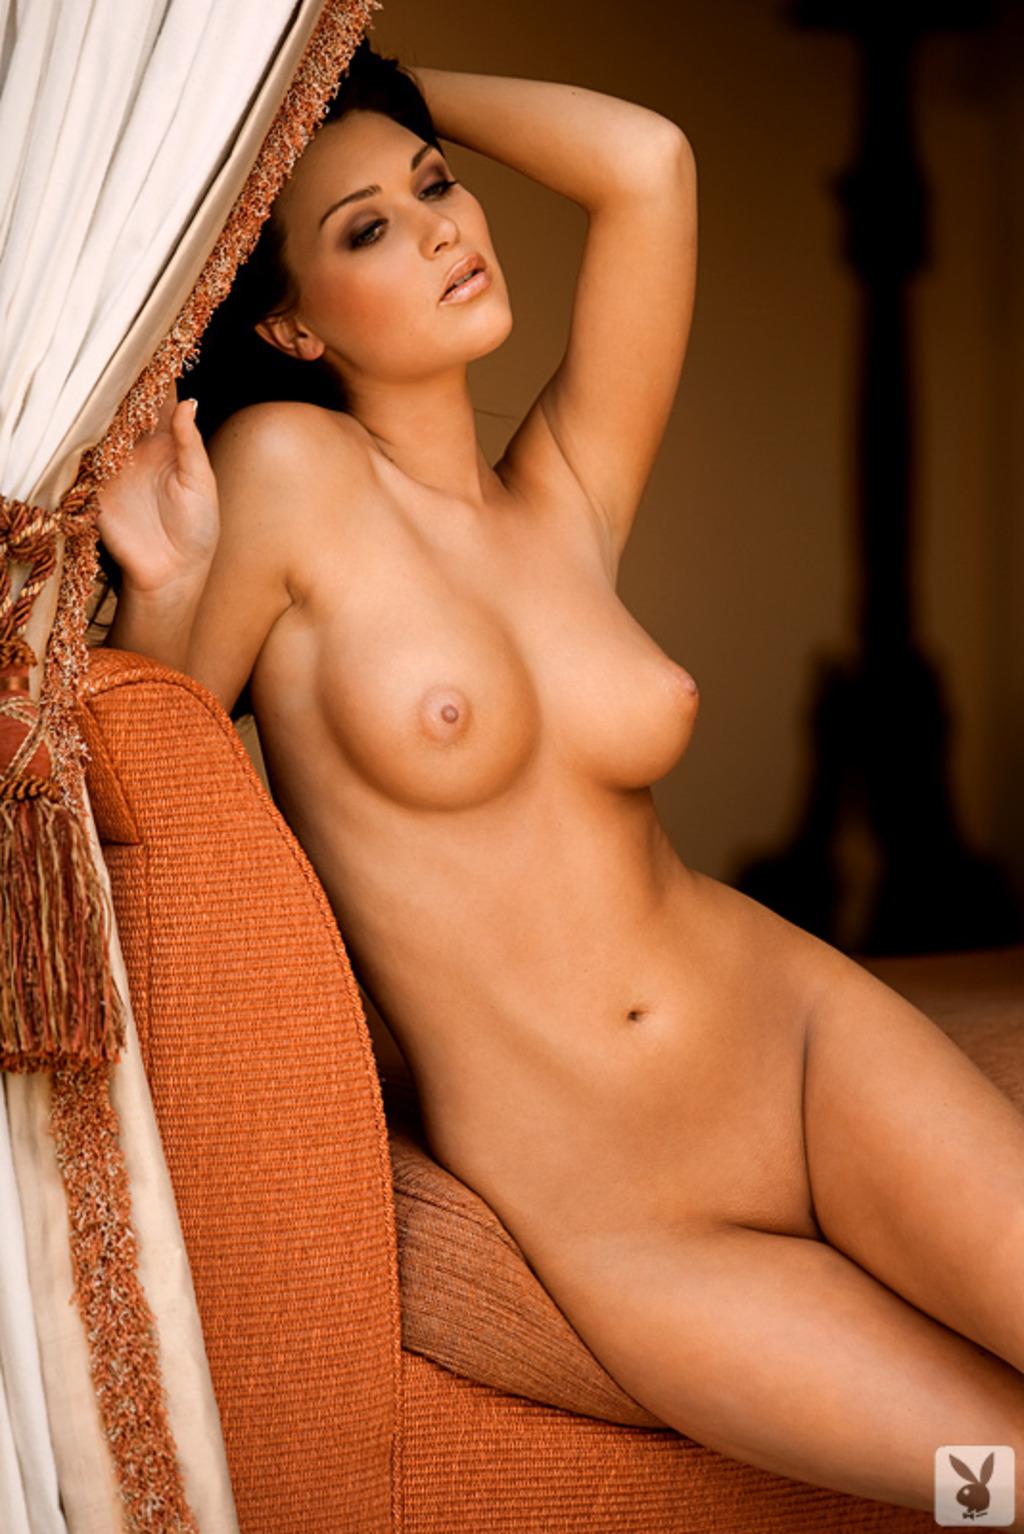 rainy day jordan - nude girls   babes   free nude girls